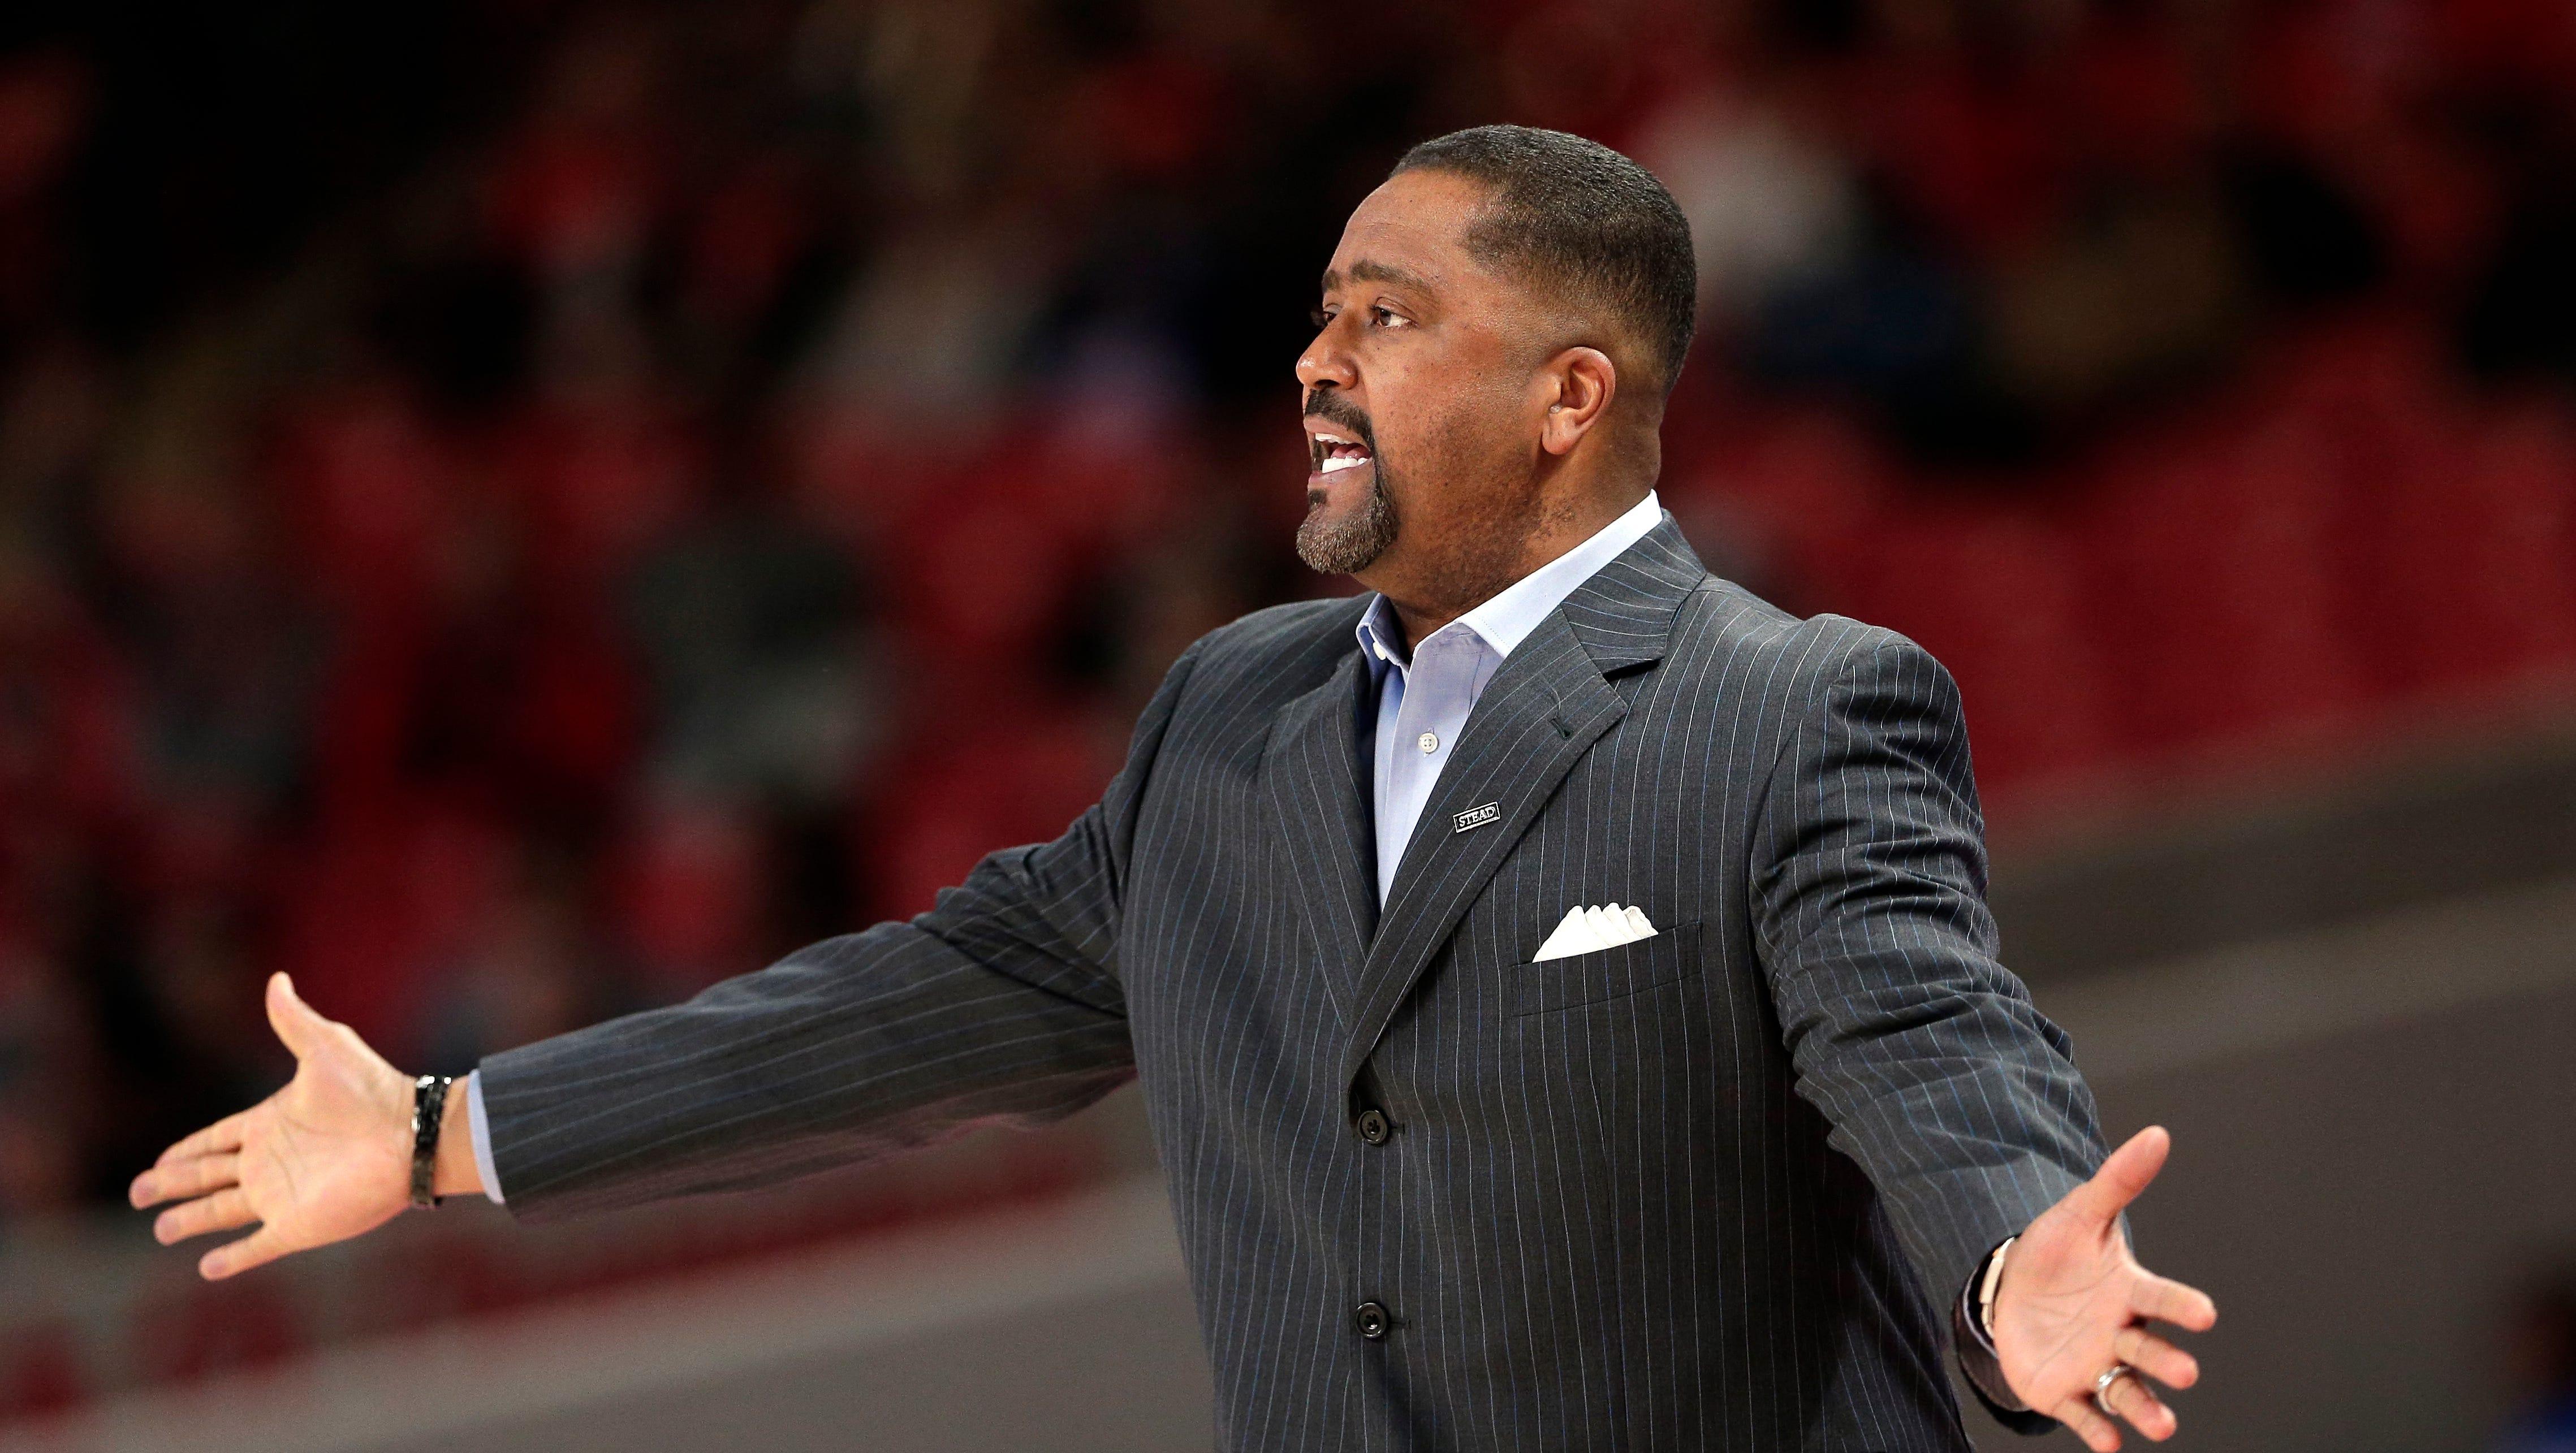 Tulsa coach Frank Haith reacts to a foul call. (AP Photo/Michael Wyke) ORG XMIT: TXMW112